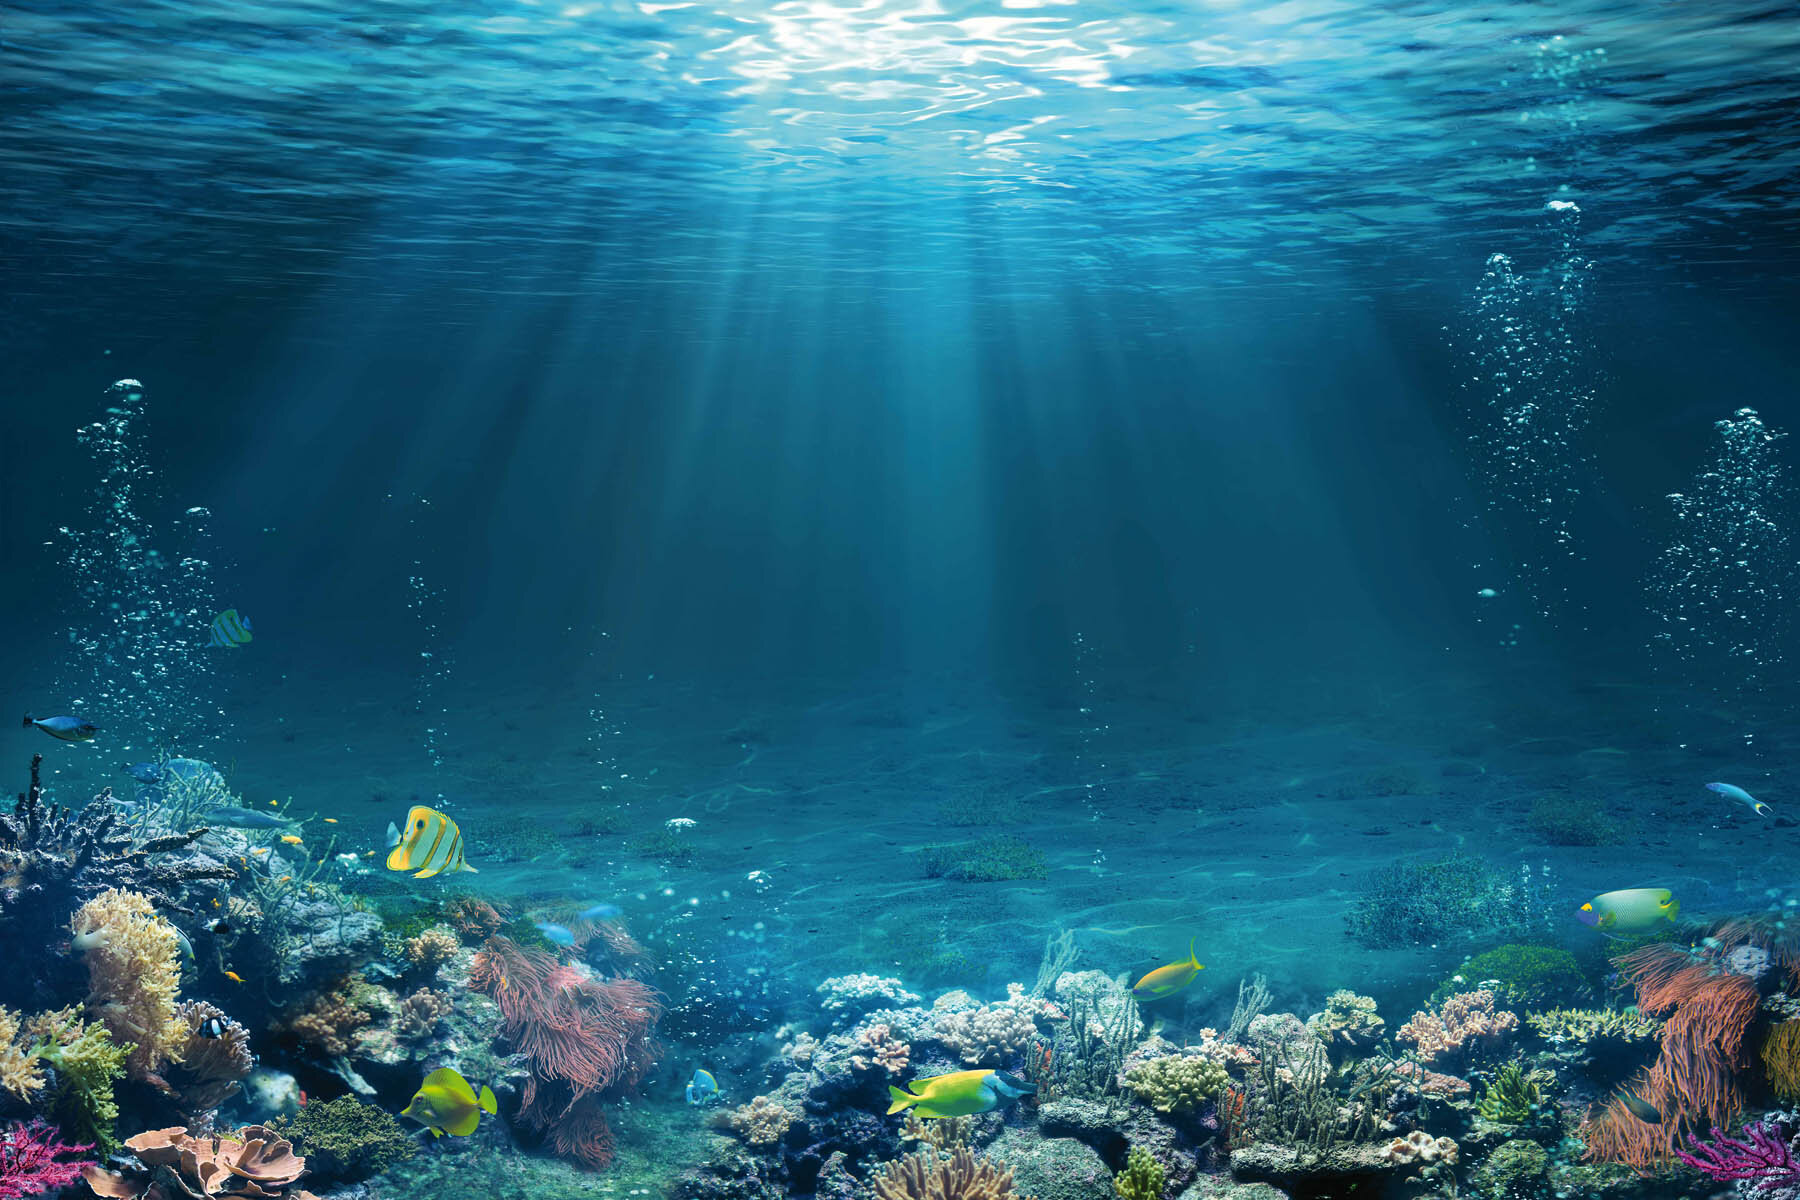 PlateART Duschrückwand mit Motiv Strand und Meer K_21_20